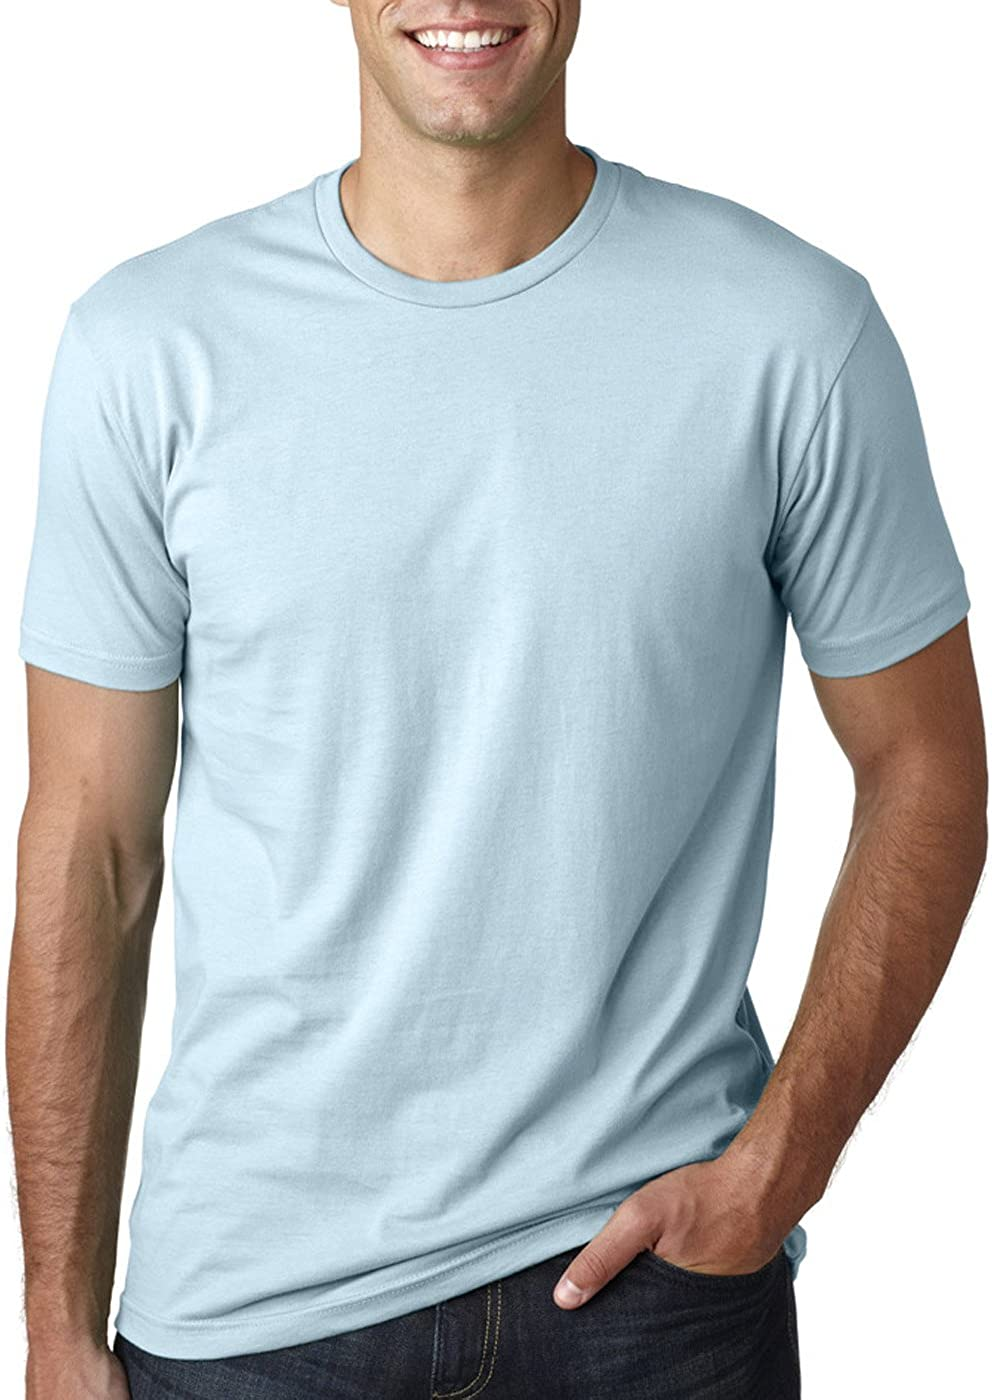 Next Level Mens Premium Fitted Short-Sleeve Crew T-Shirt 2 Pack - XX-Larte Black Kelly Green